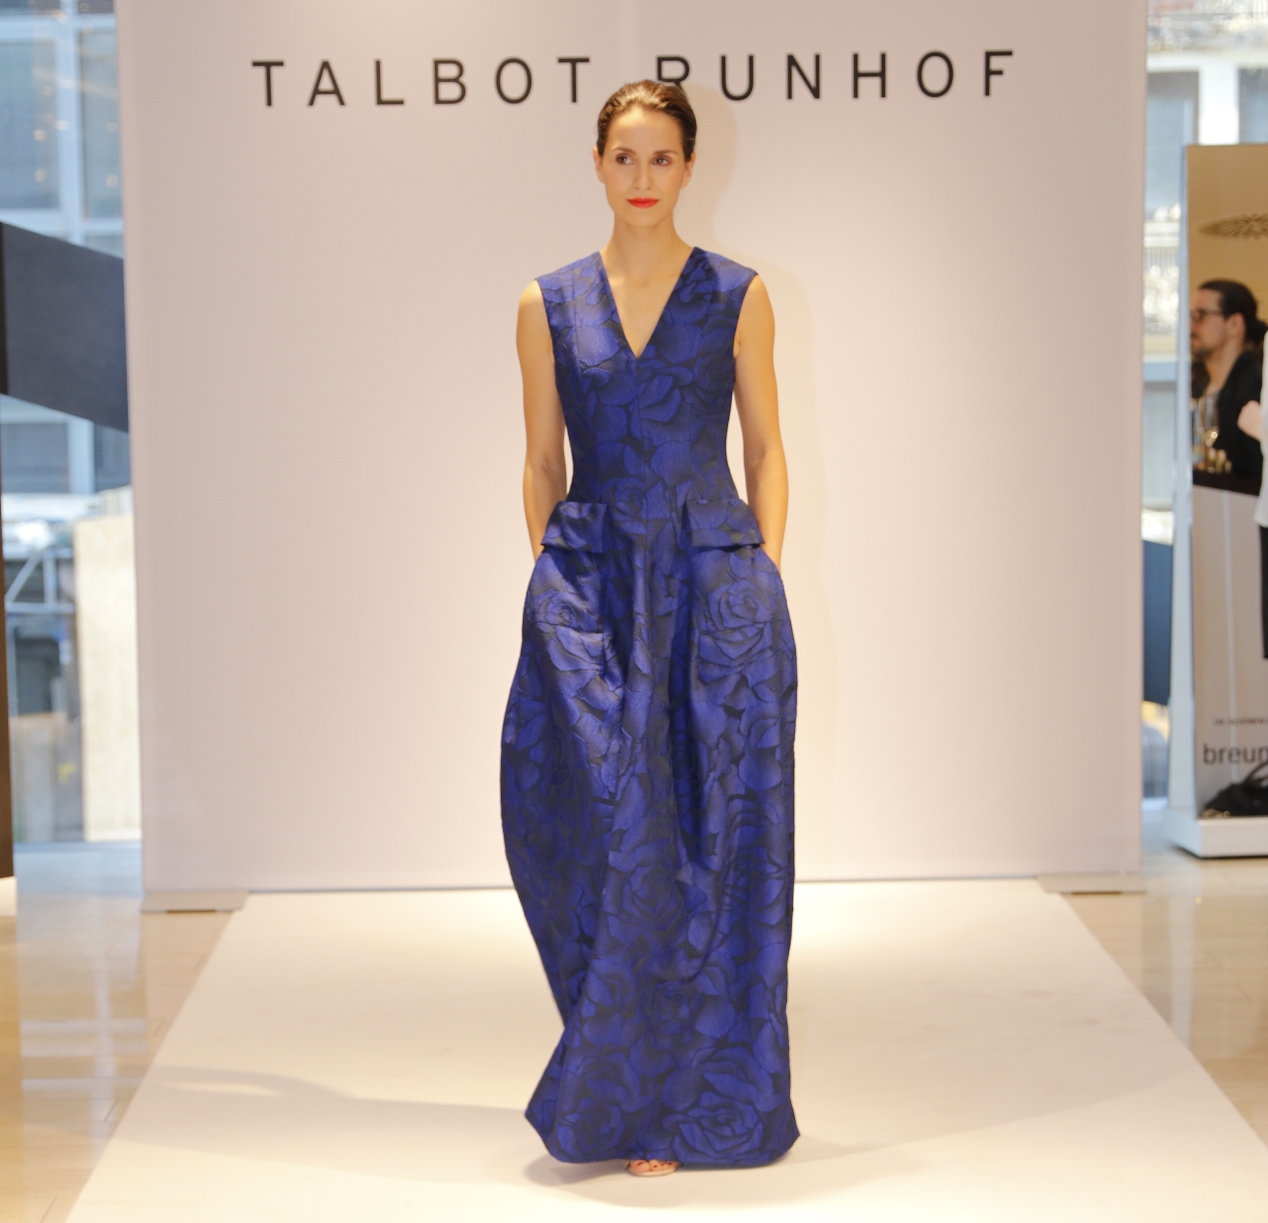 Talbot Runhof Kleid, Talbot Runhof Fashion Show, Breuninger Düsseldorf, Fashion-Blog, Lieblingsstil.com,3